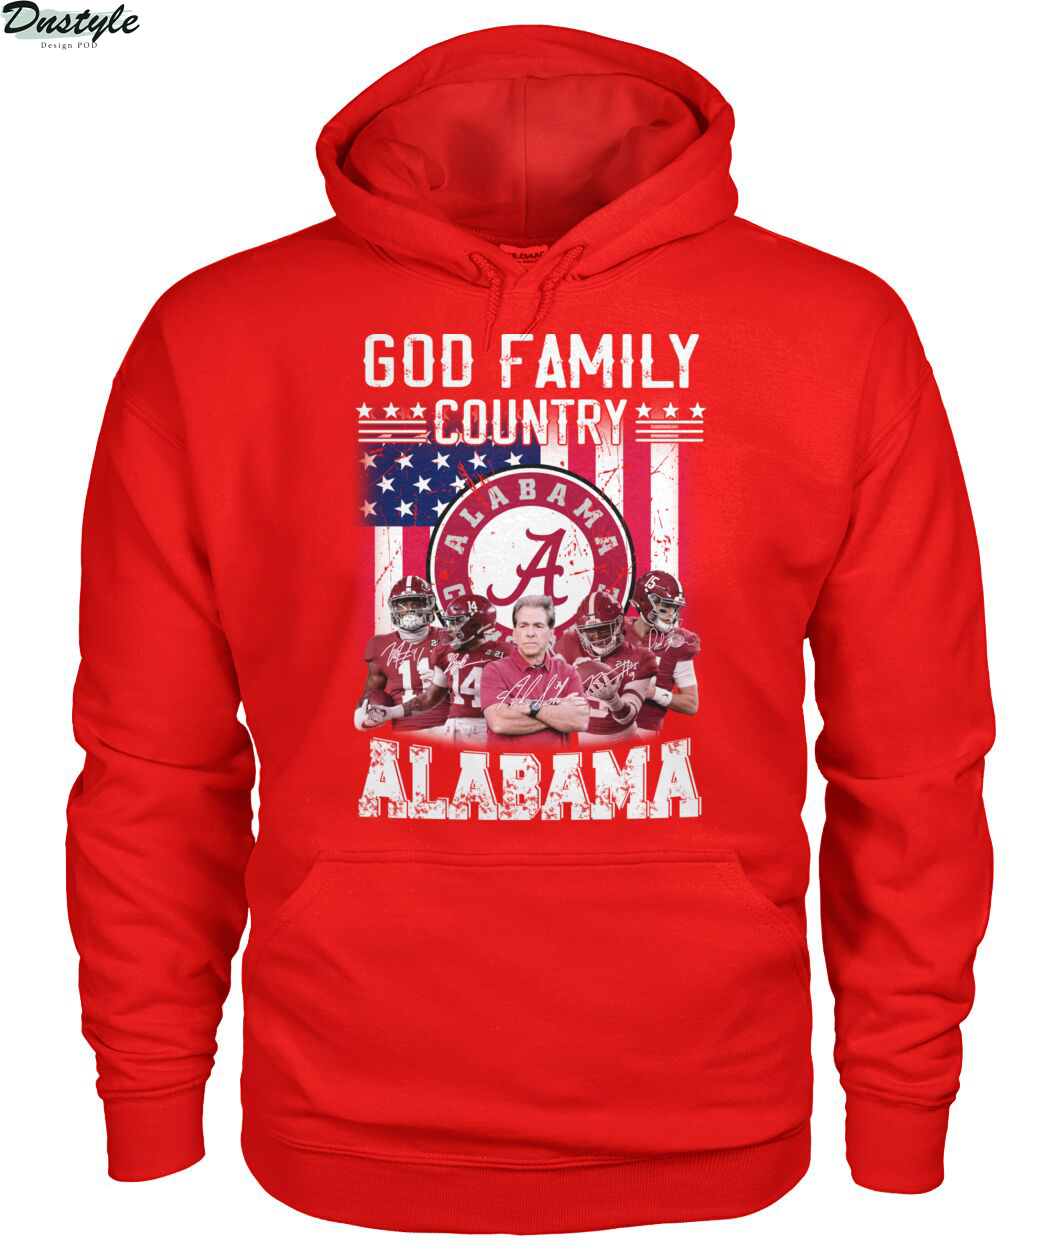 God family country Alabama crimson tide american flag hoodie